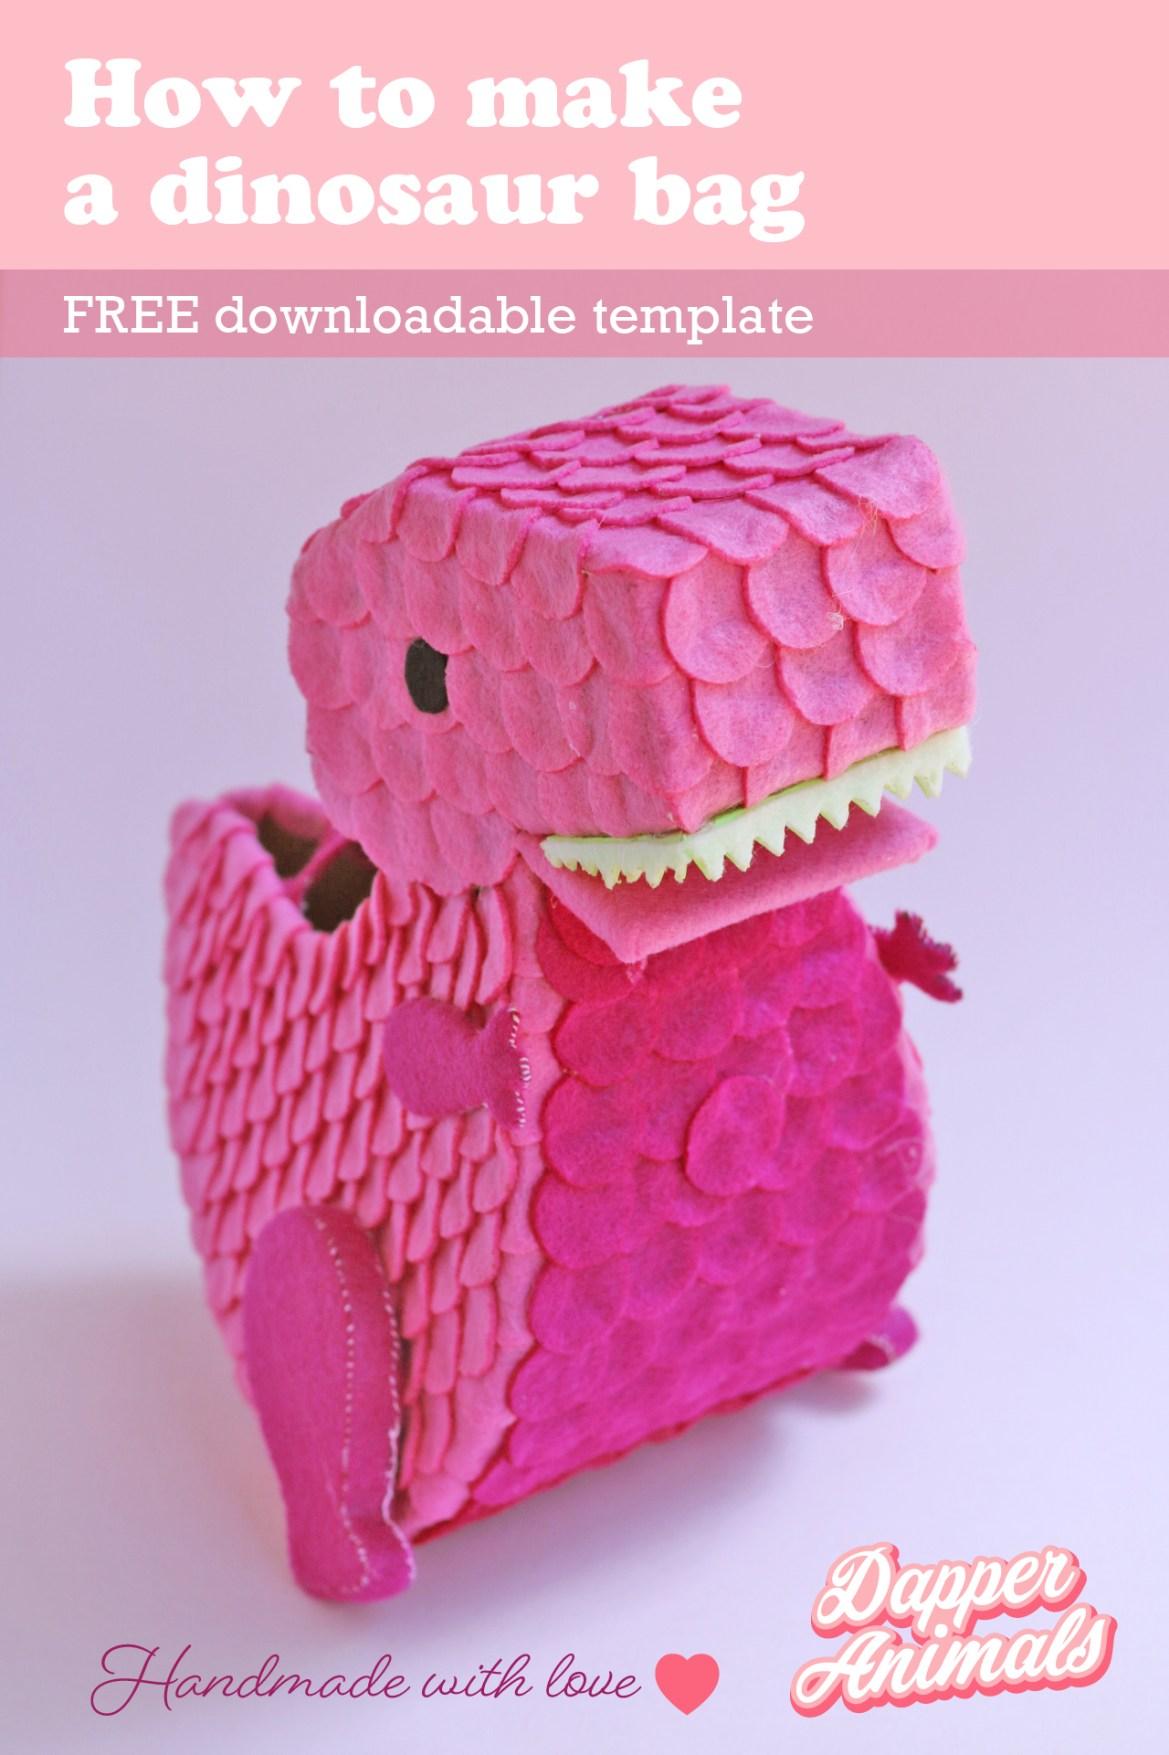 Step by Step tutorial to make an adorable felt dinosaur purse